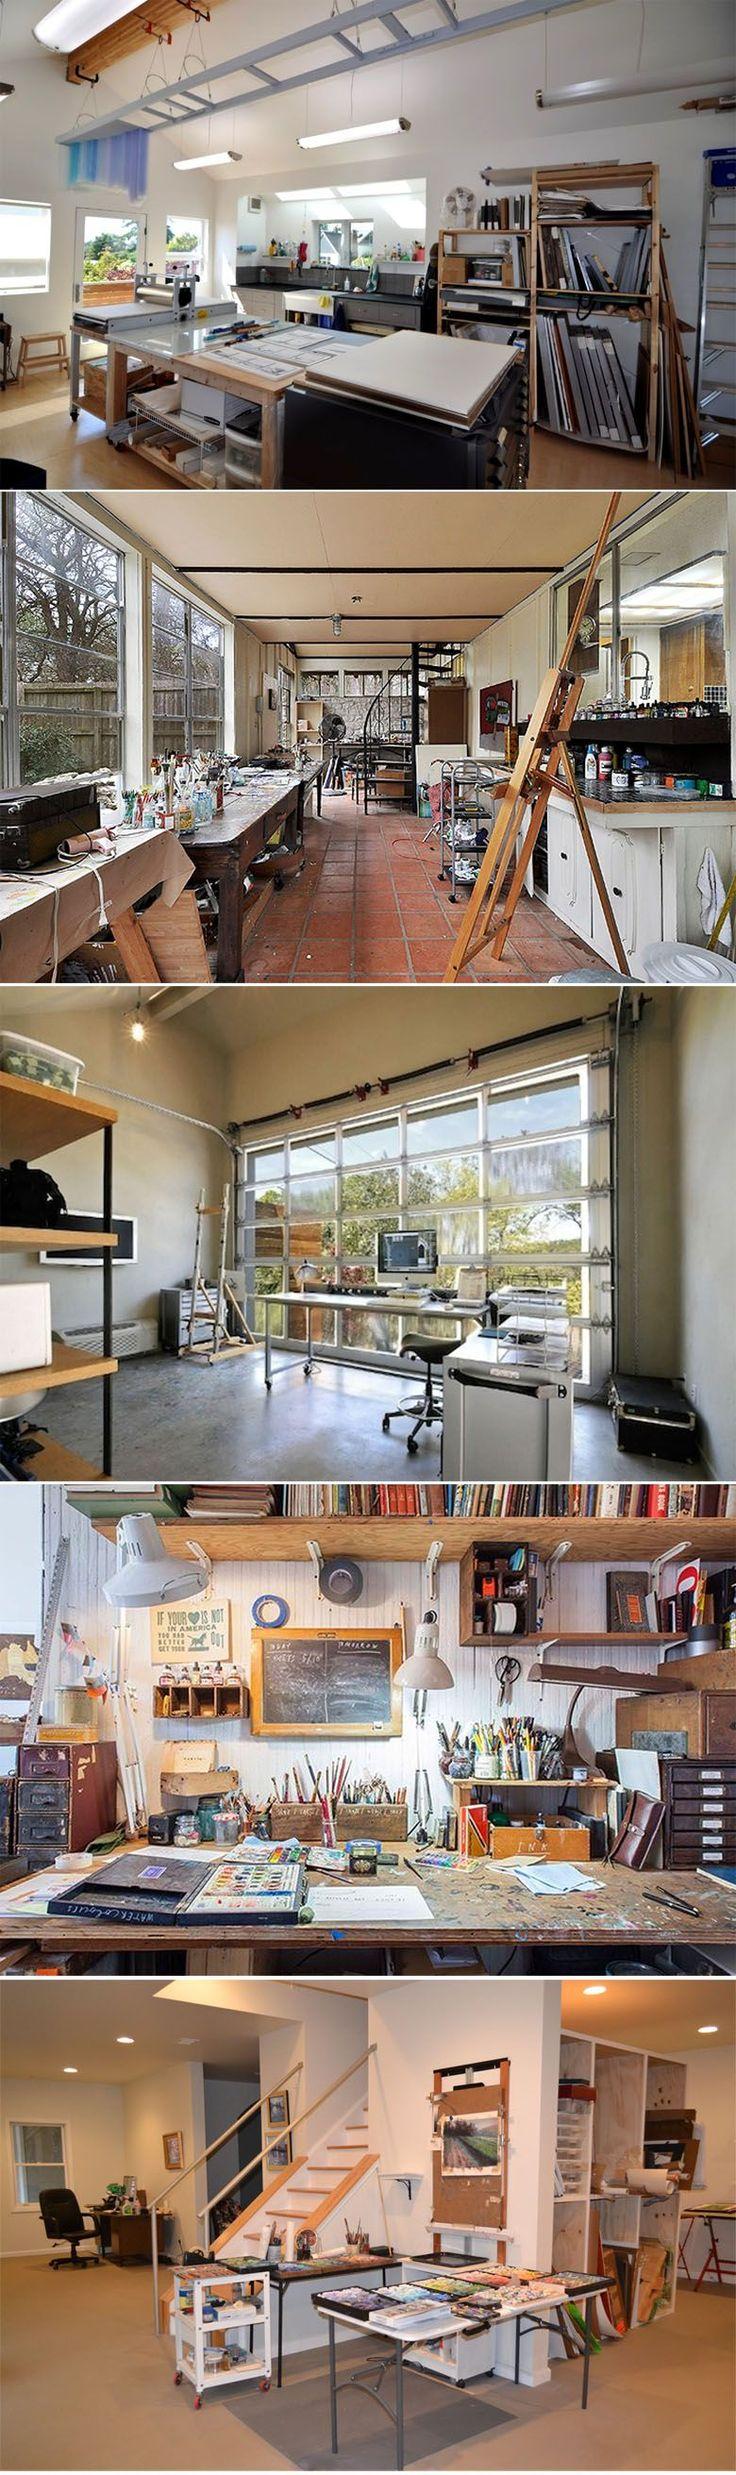 Find this Pin and more on Salas de artesanato. Creative Home Studio /  Workspace idea Artist studio